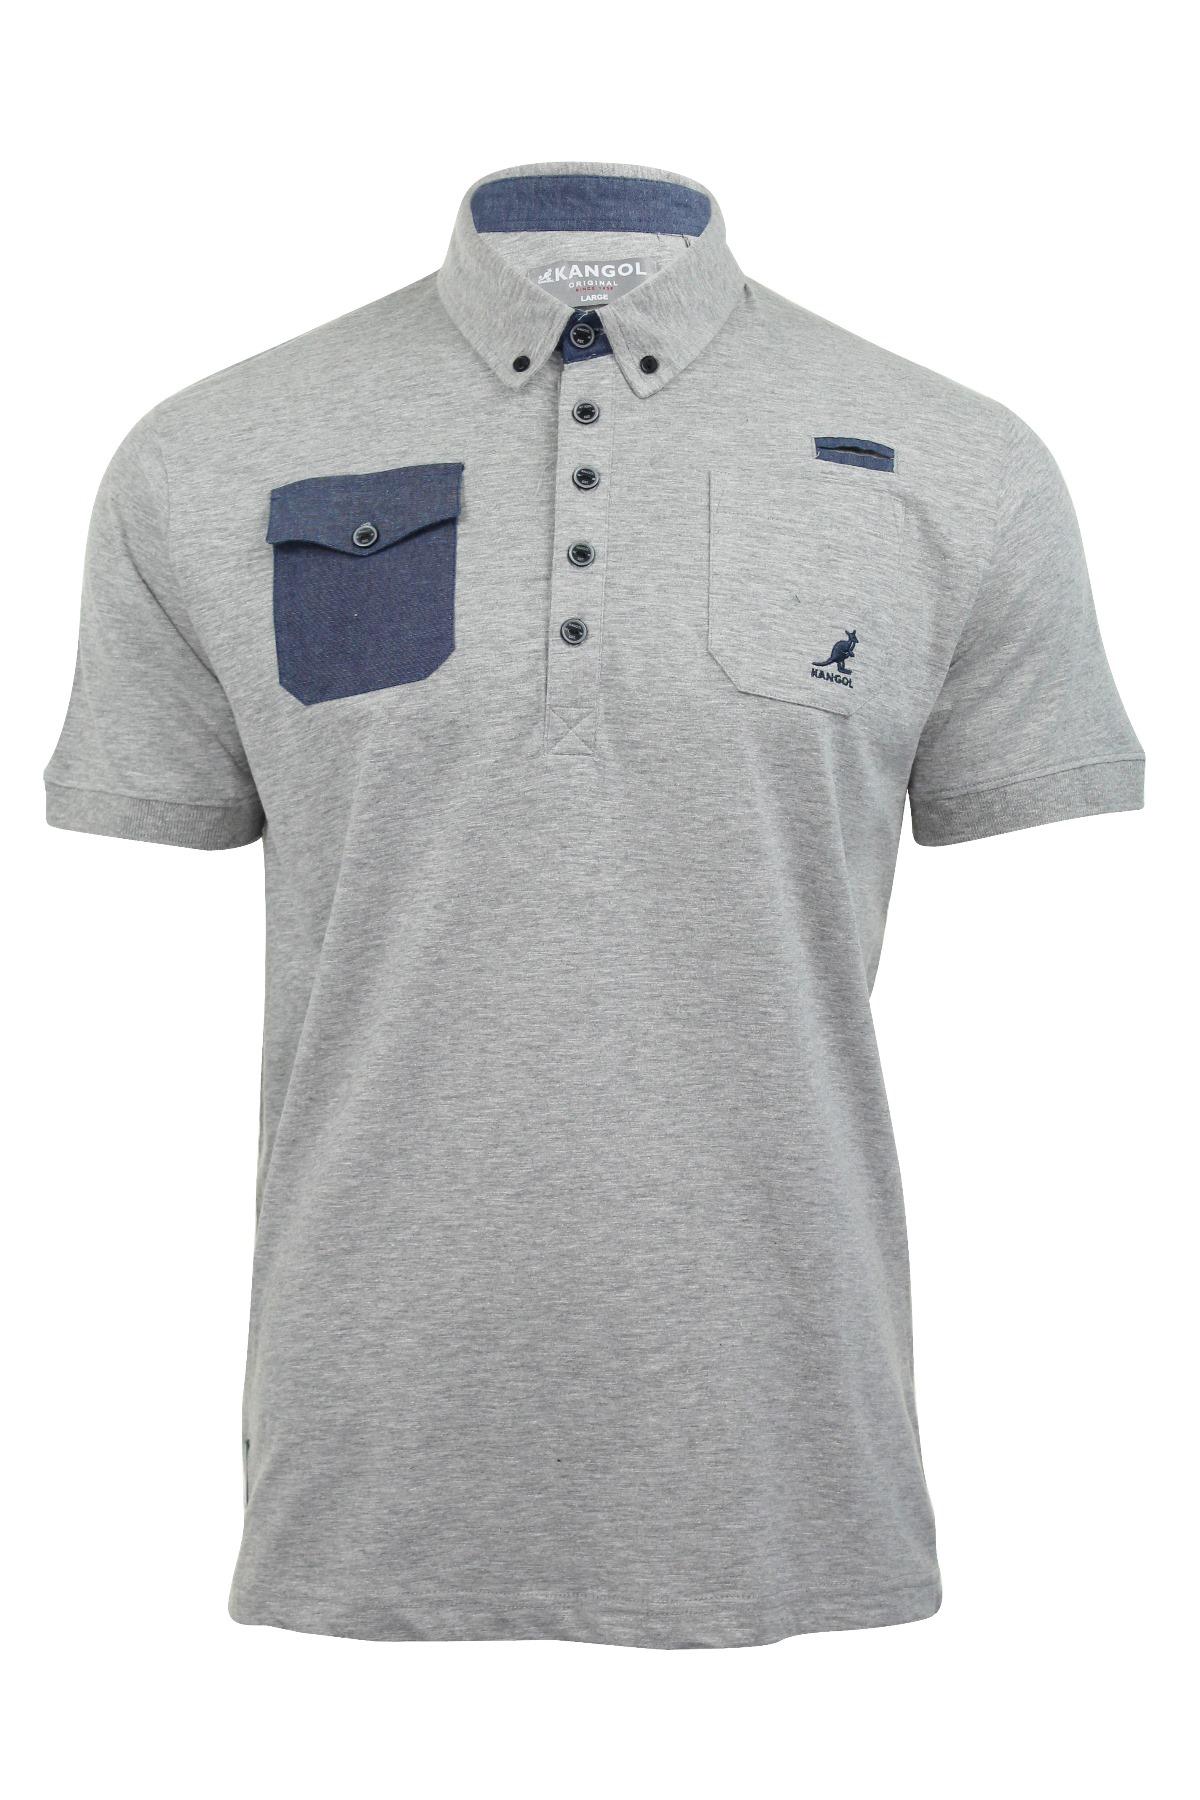 Mens Polo Shirt 'Zellor' Jersey T Shirts Button Down Collar | eBay